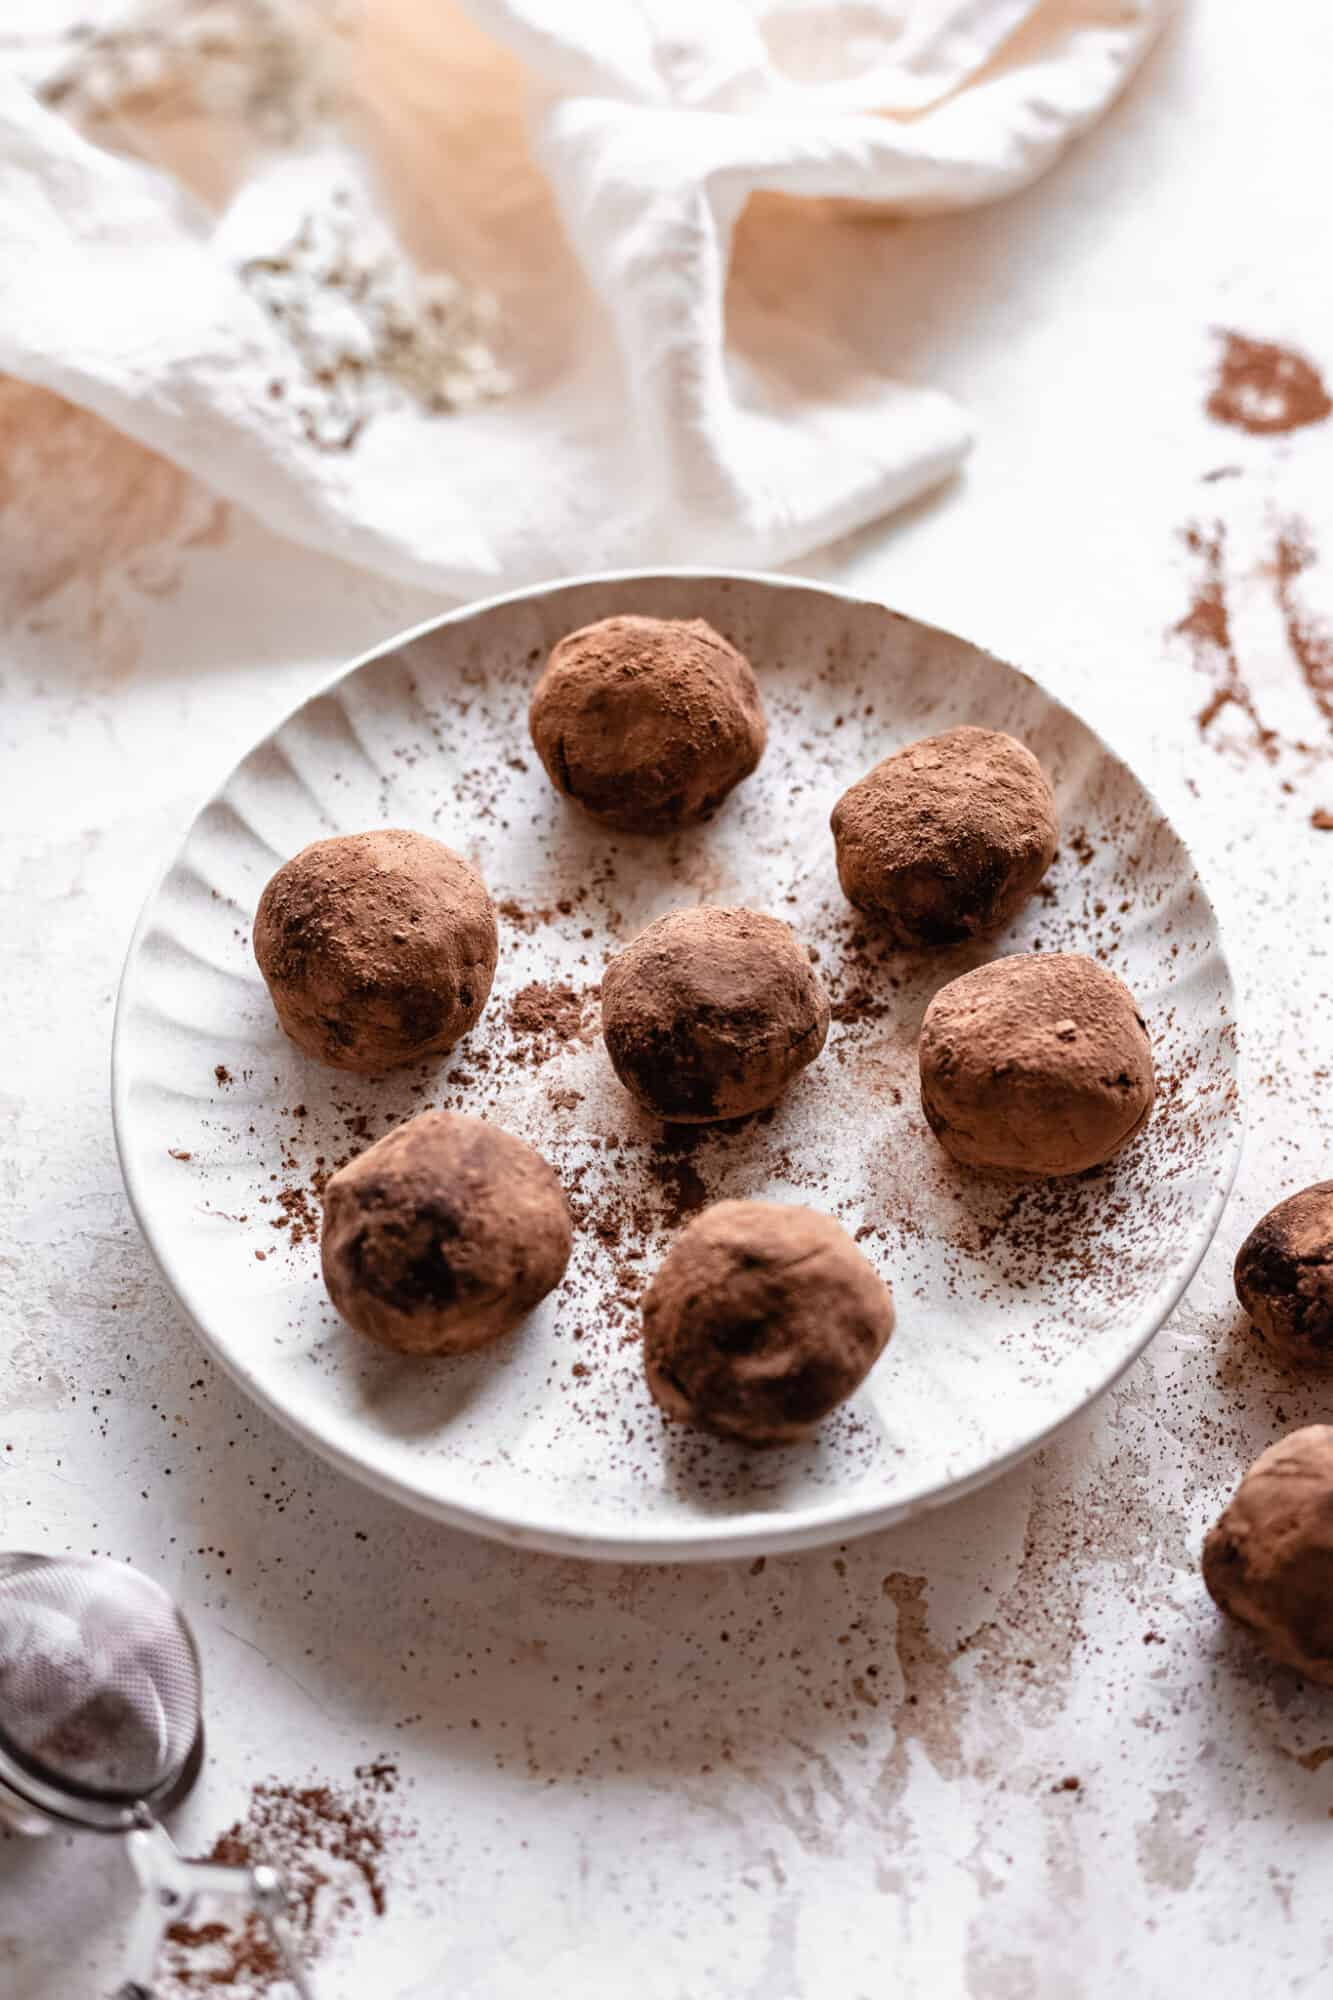 vegan chocolate truffles on plate